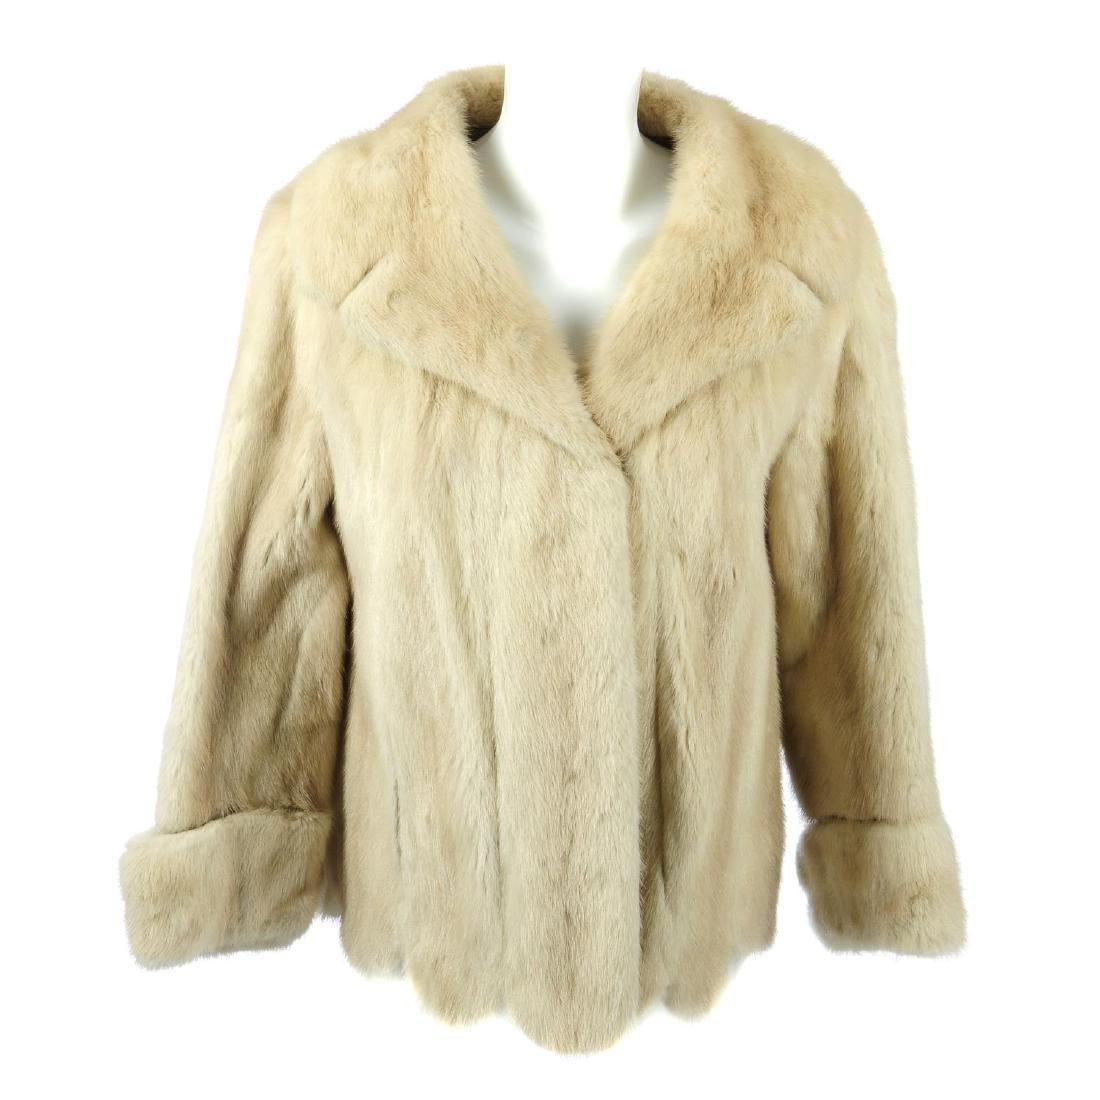 A tourmaline mink jacket with scalloped hem. Featuring